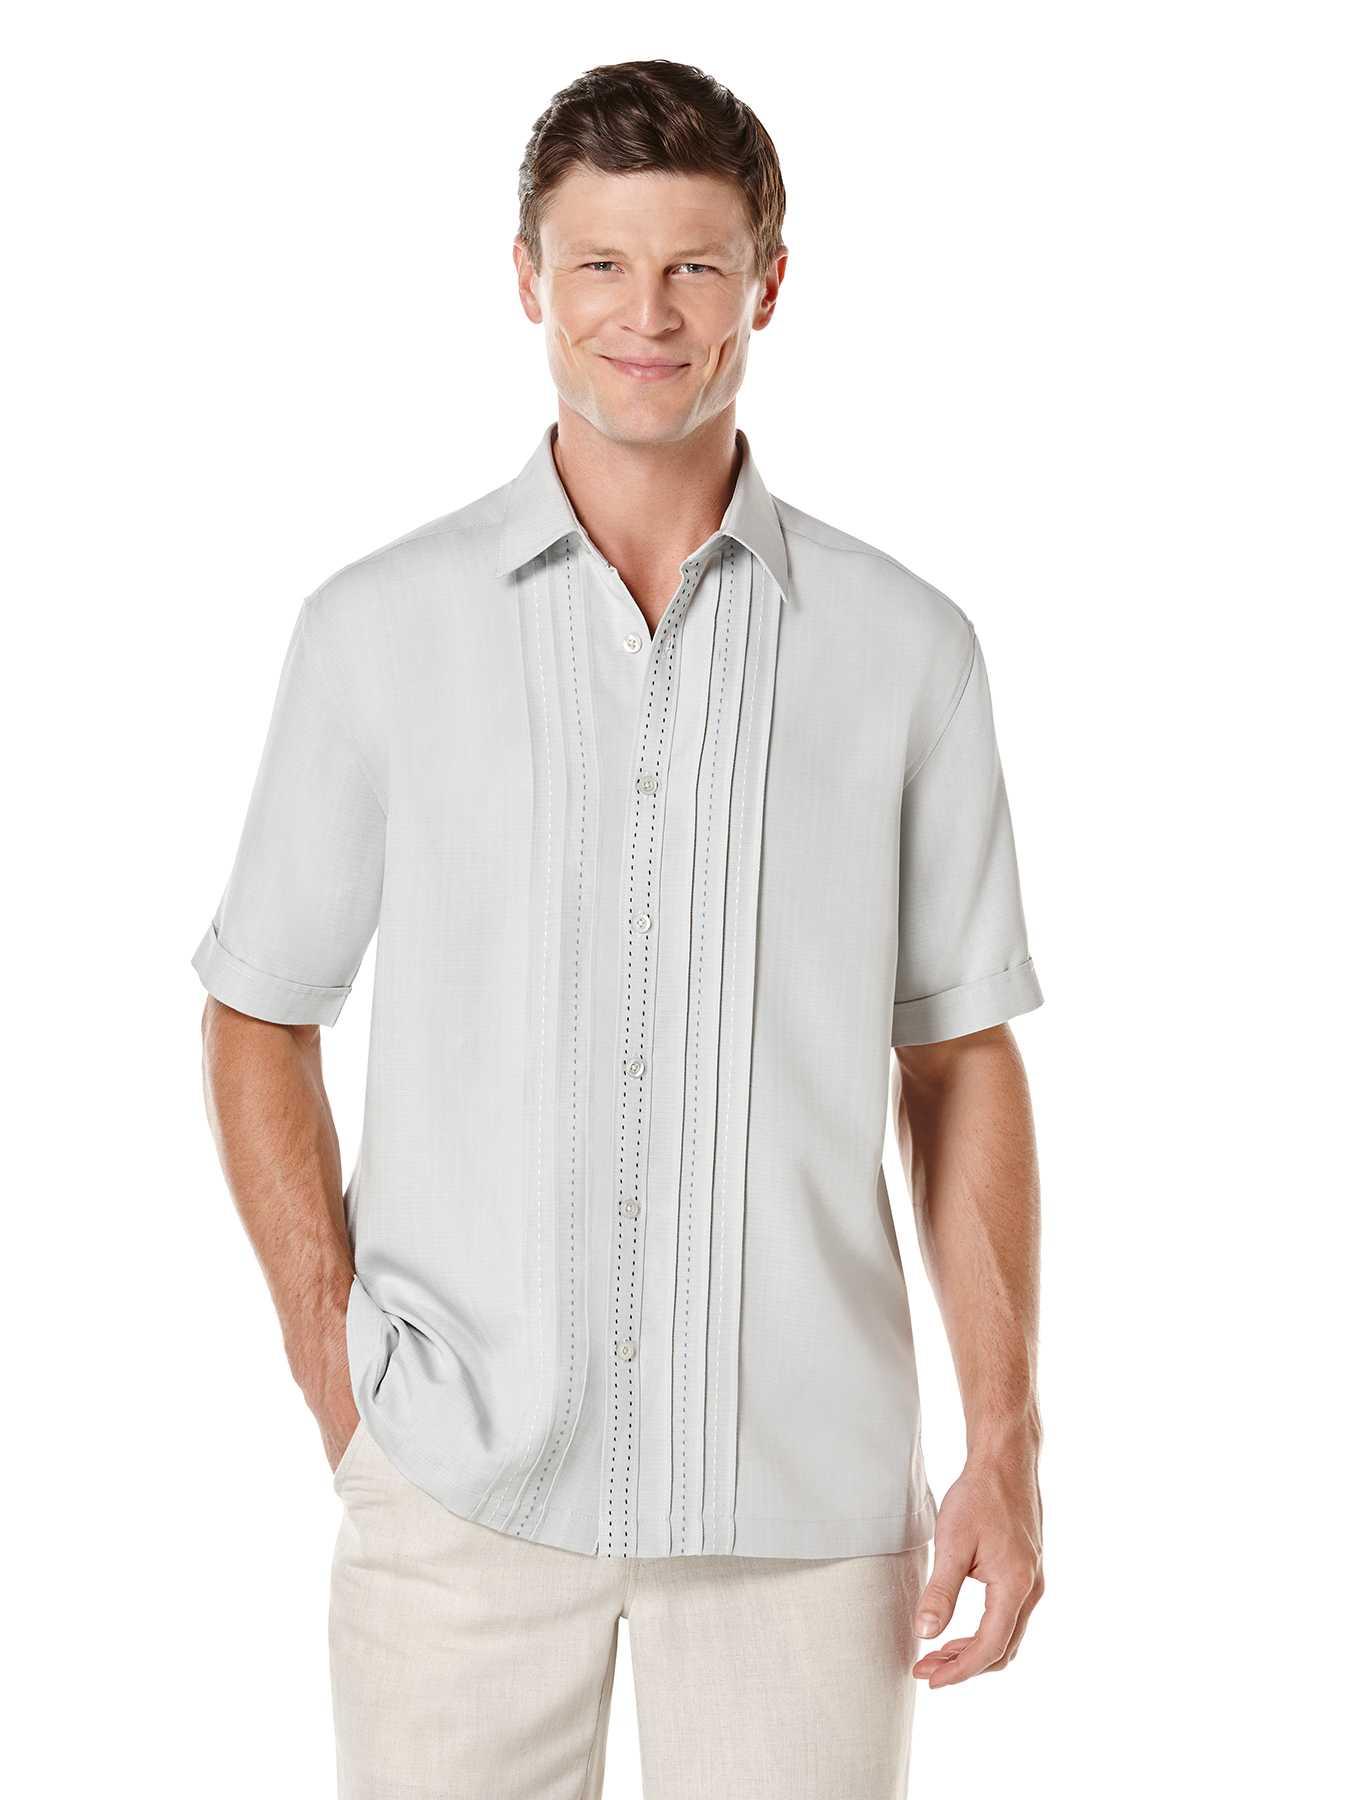 Cubavera Big & Tall Short Sleeve Front Pin Tucks With Pick Stitch